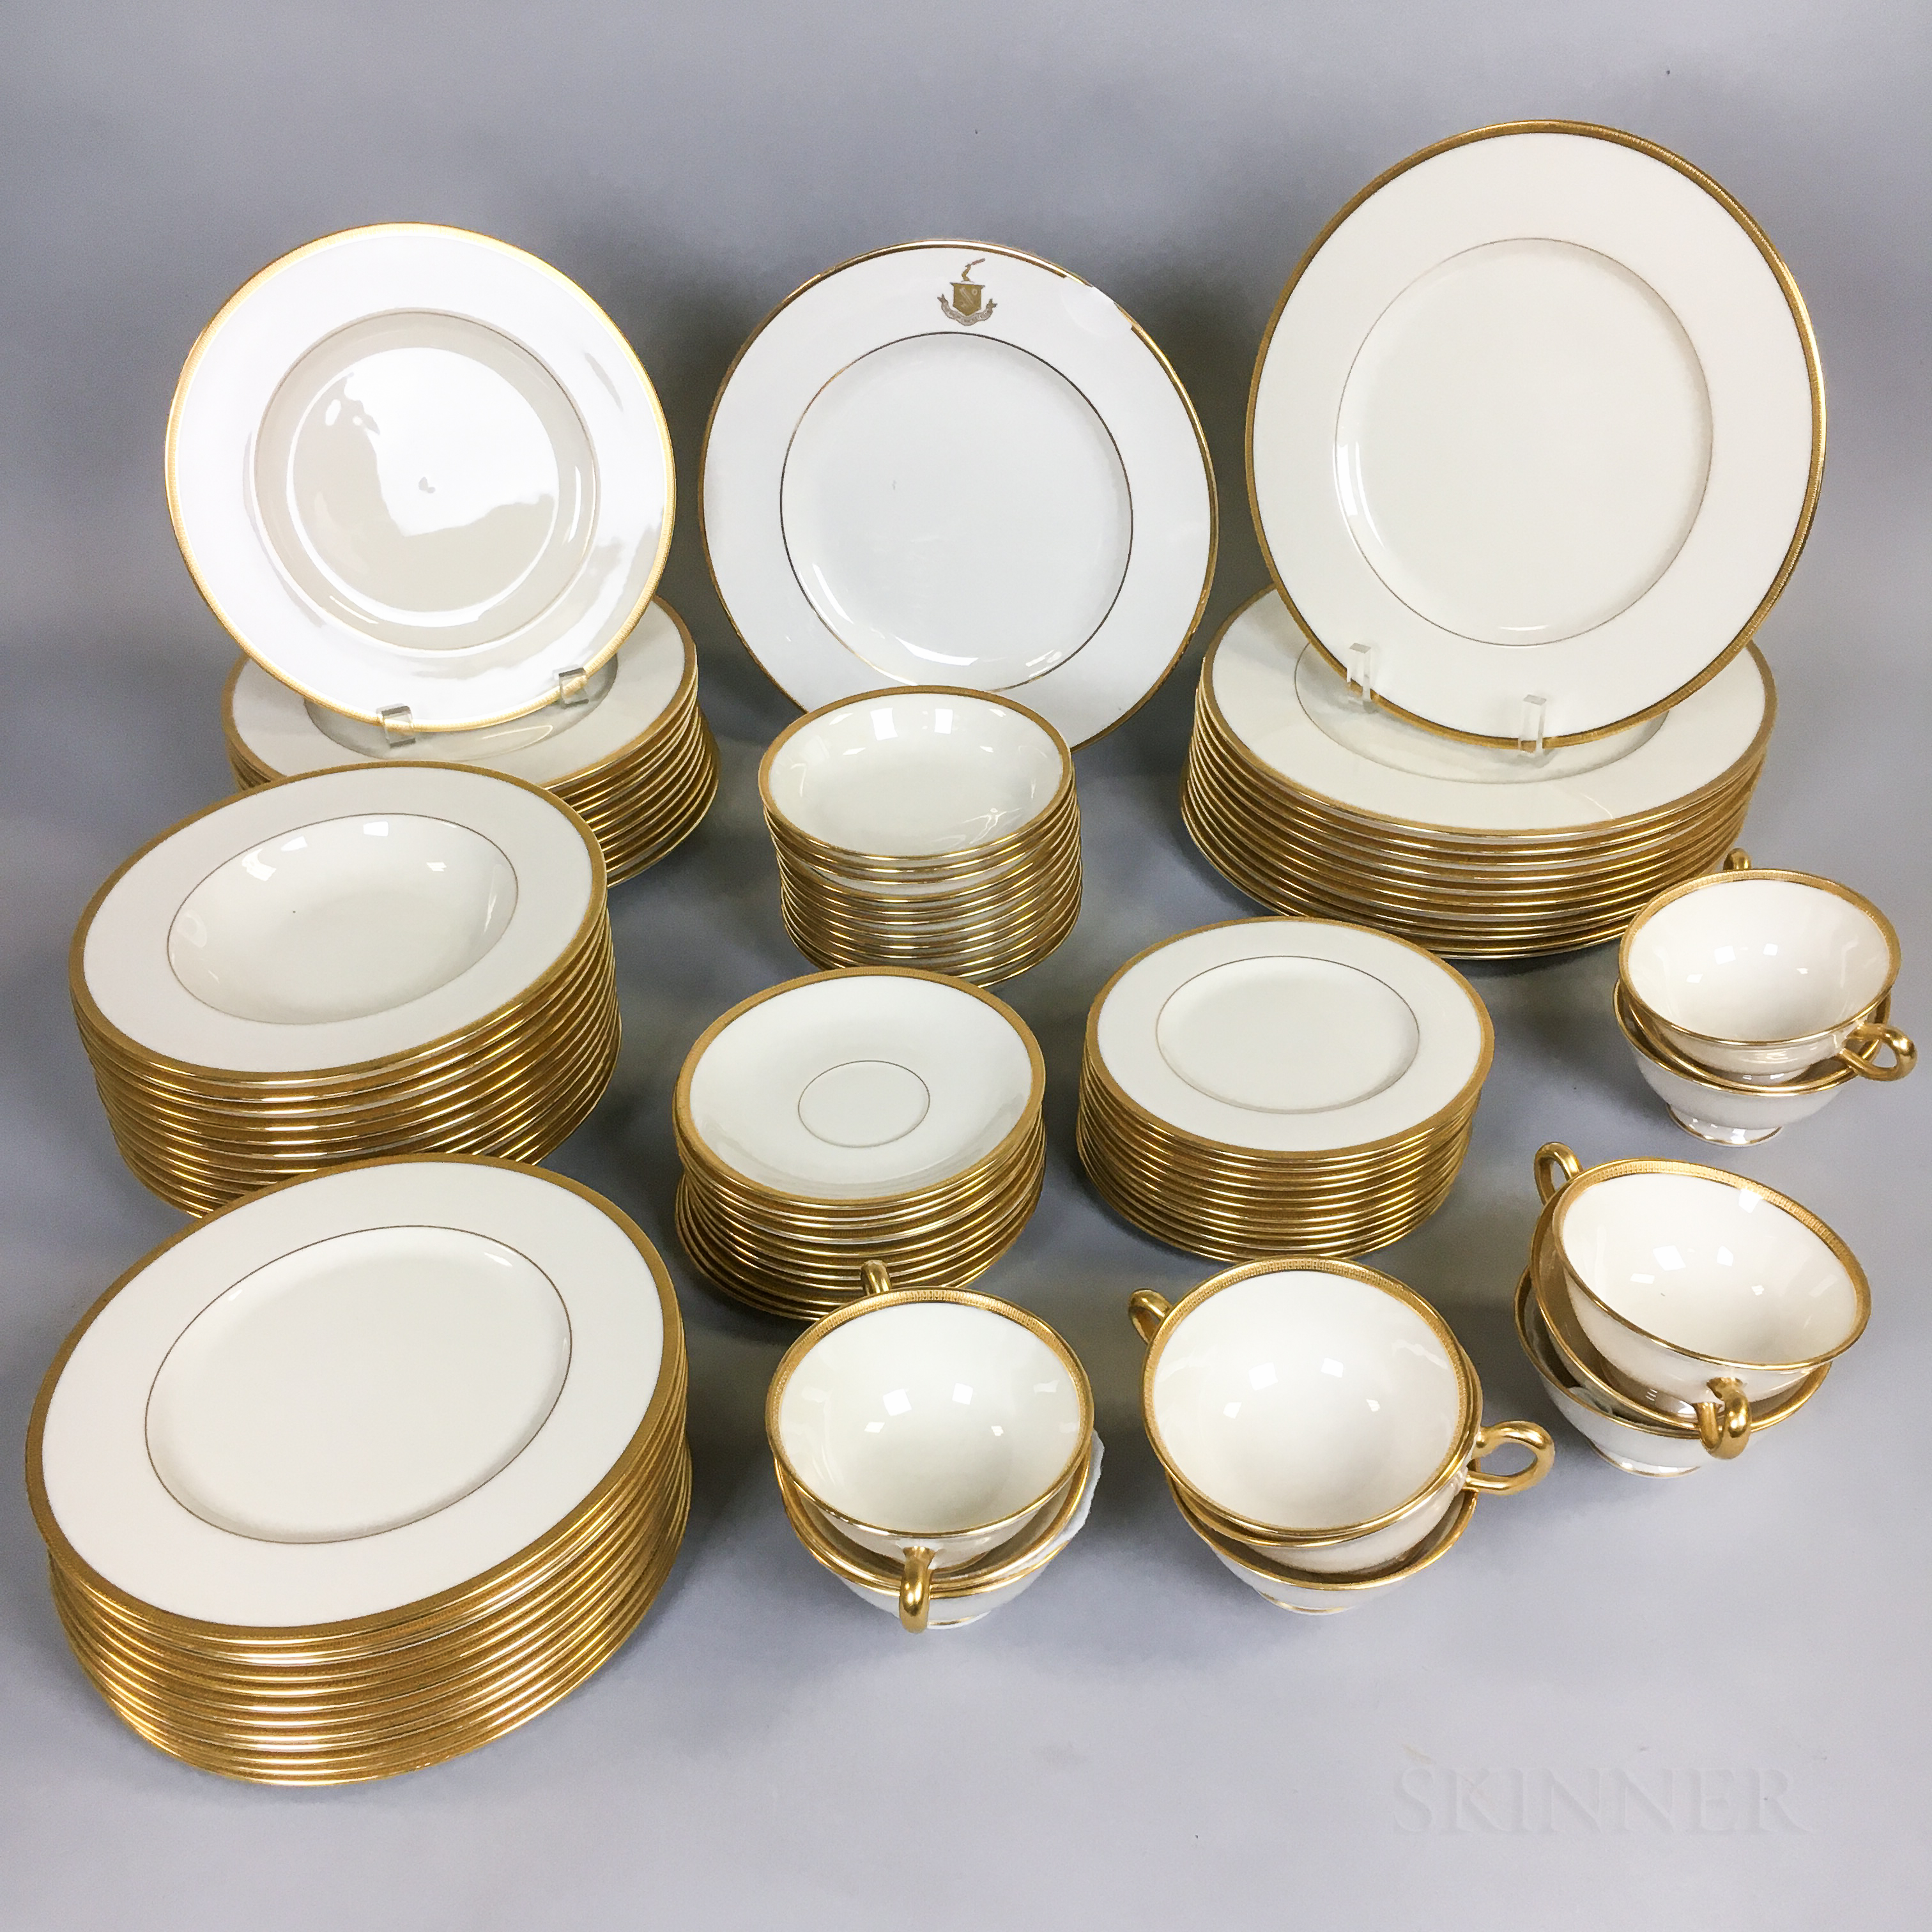 Lenox Gilt-rimmed Porcelain Dinner Service for Twelve.     Estimate $200-300